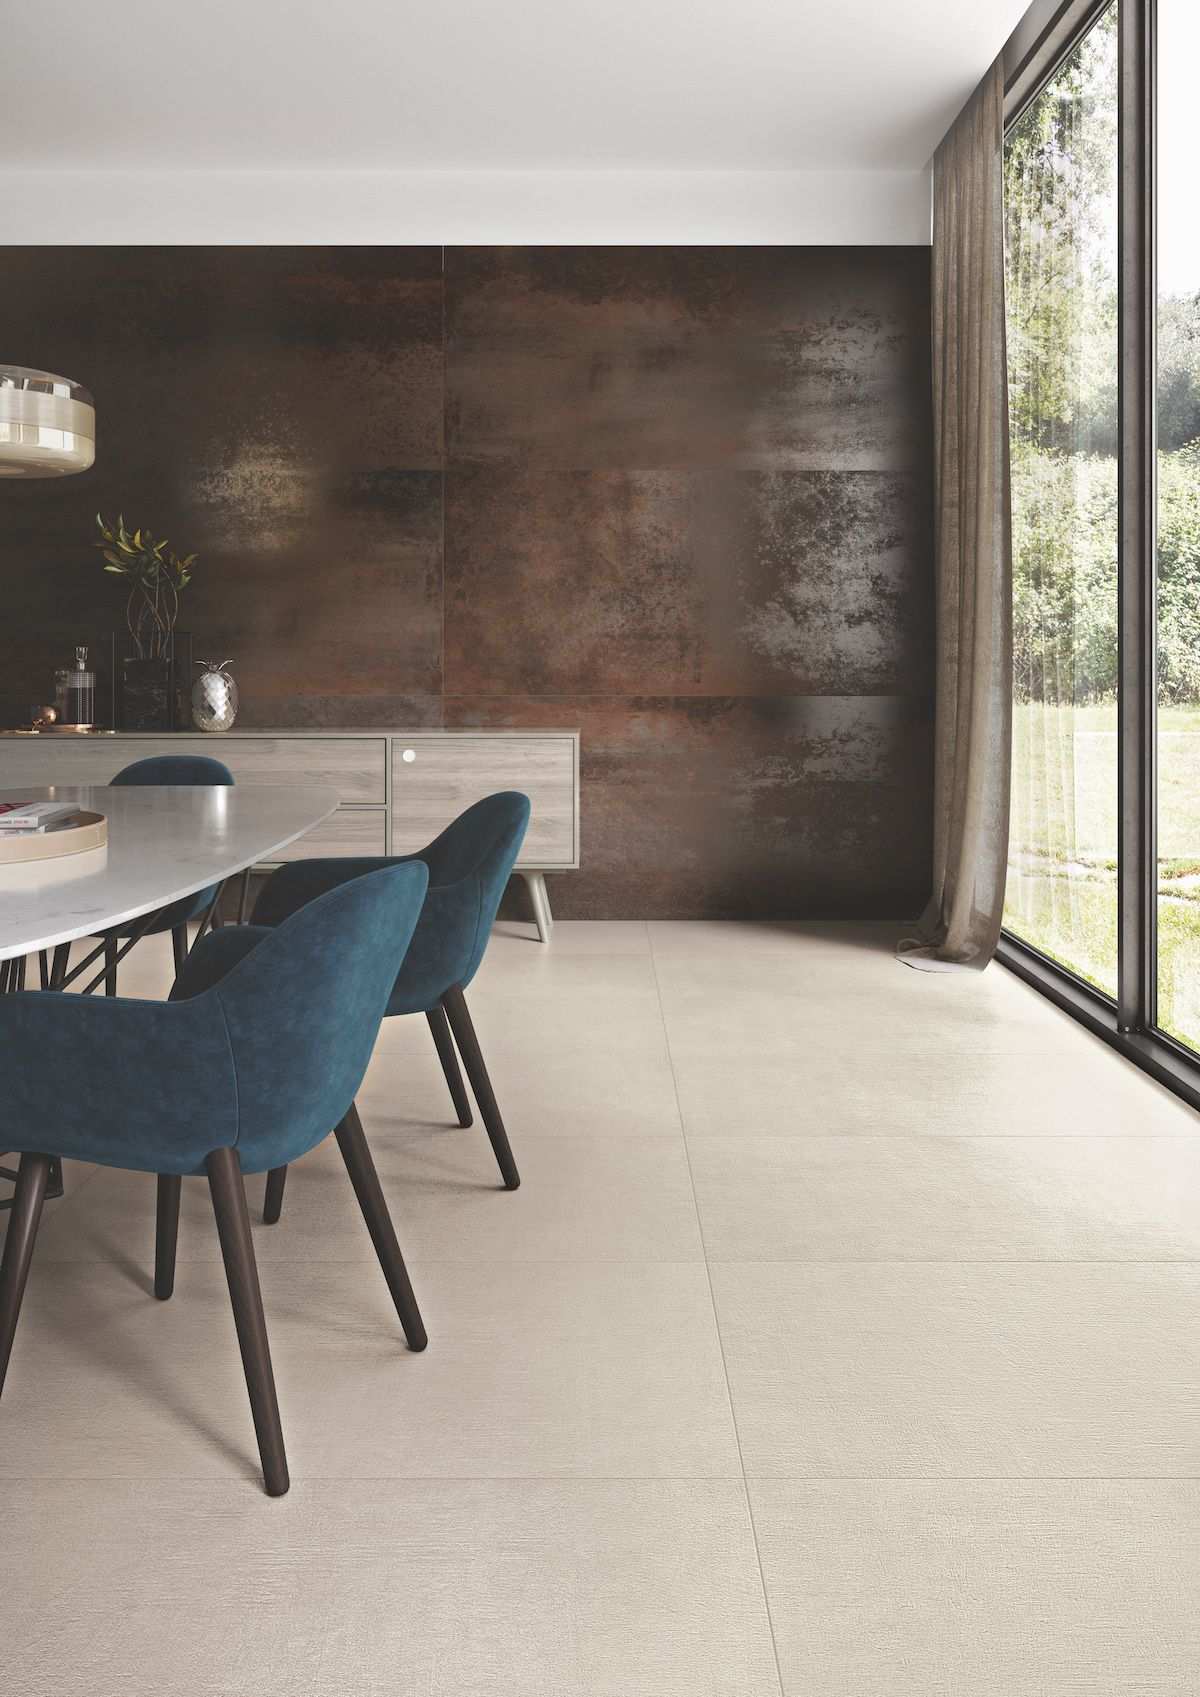 Carrelage Effet Beton Texture 60x60 Avorio Rectifie Collection Costruire Argilla Serenissima Idee Carrelage Carrelage Sol Carrelage Beige